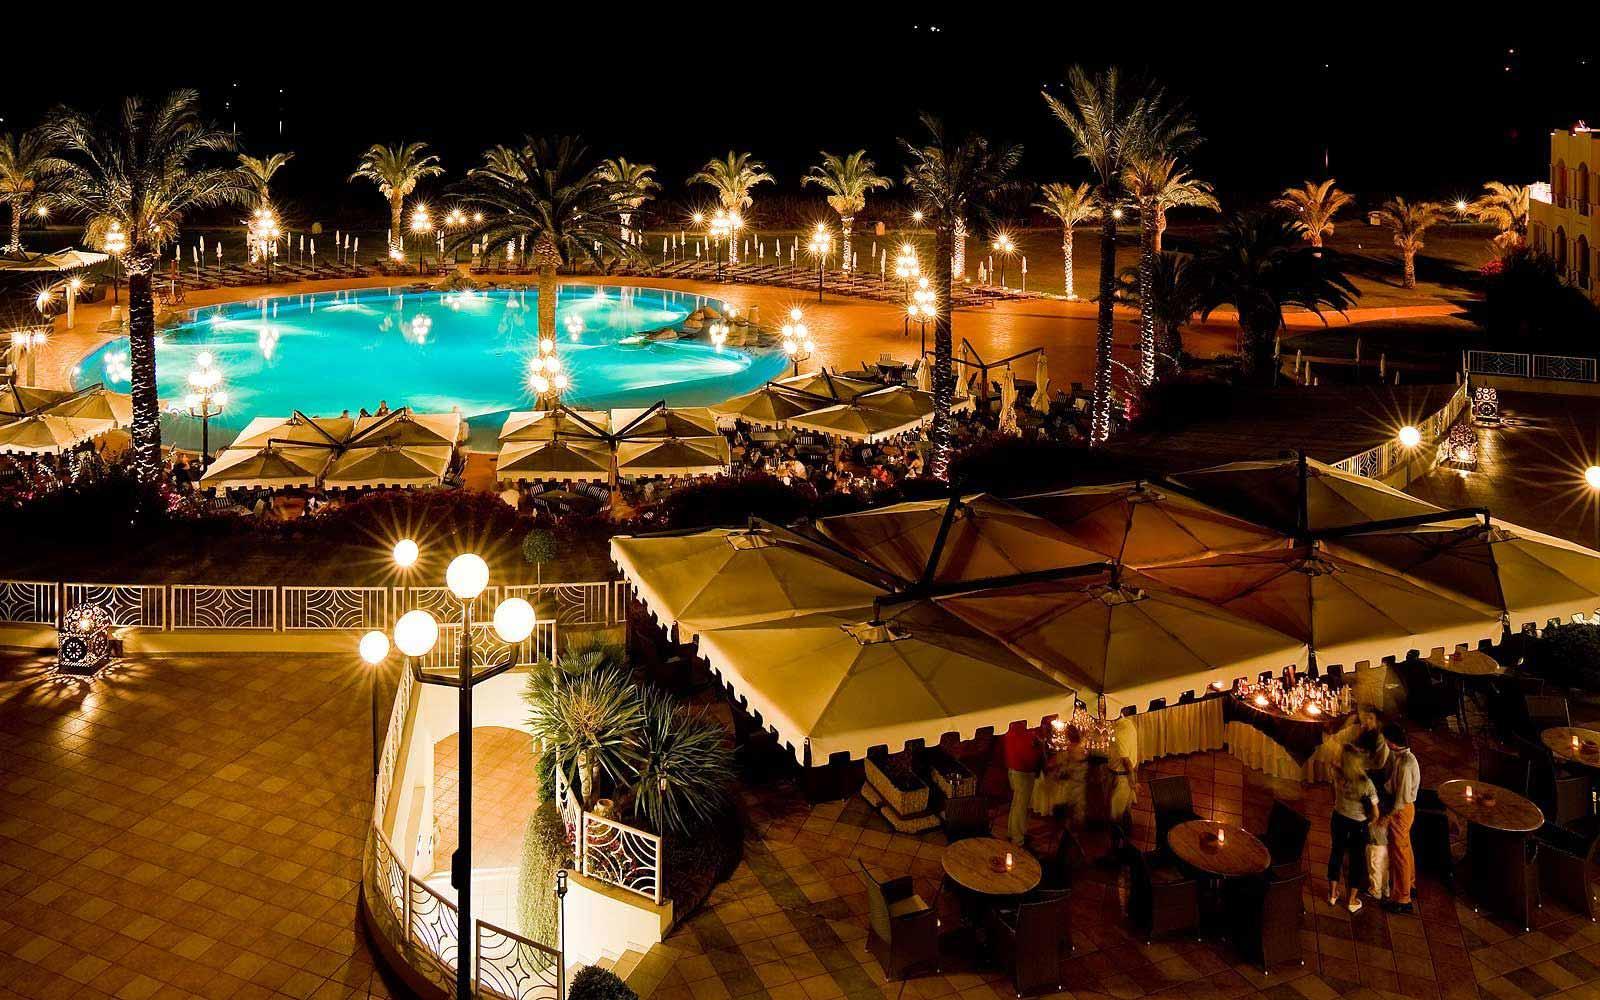 Pullman Timi Ama Sardegna's swimming pool area at night